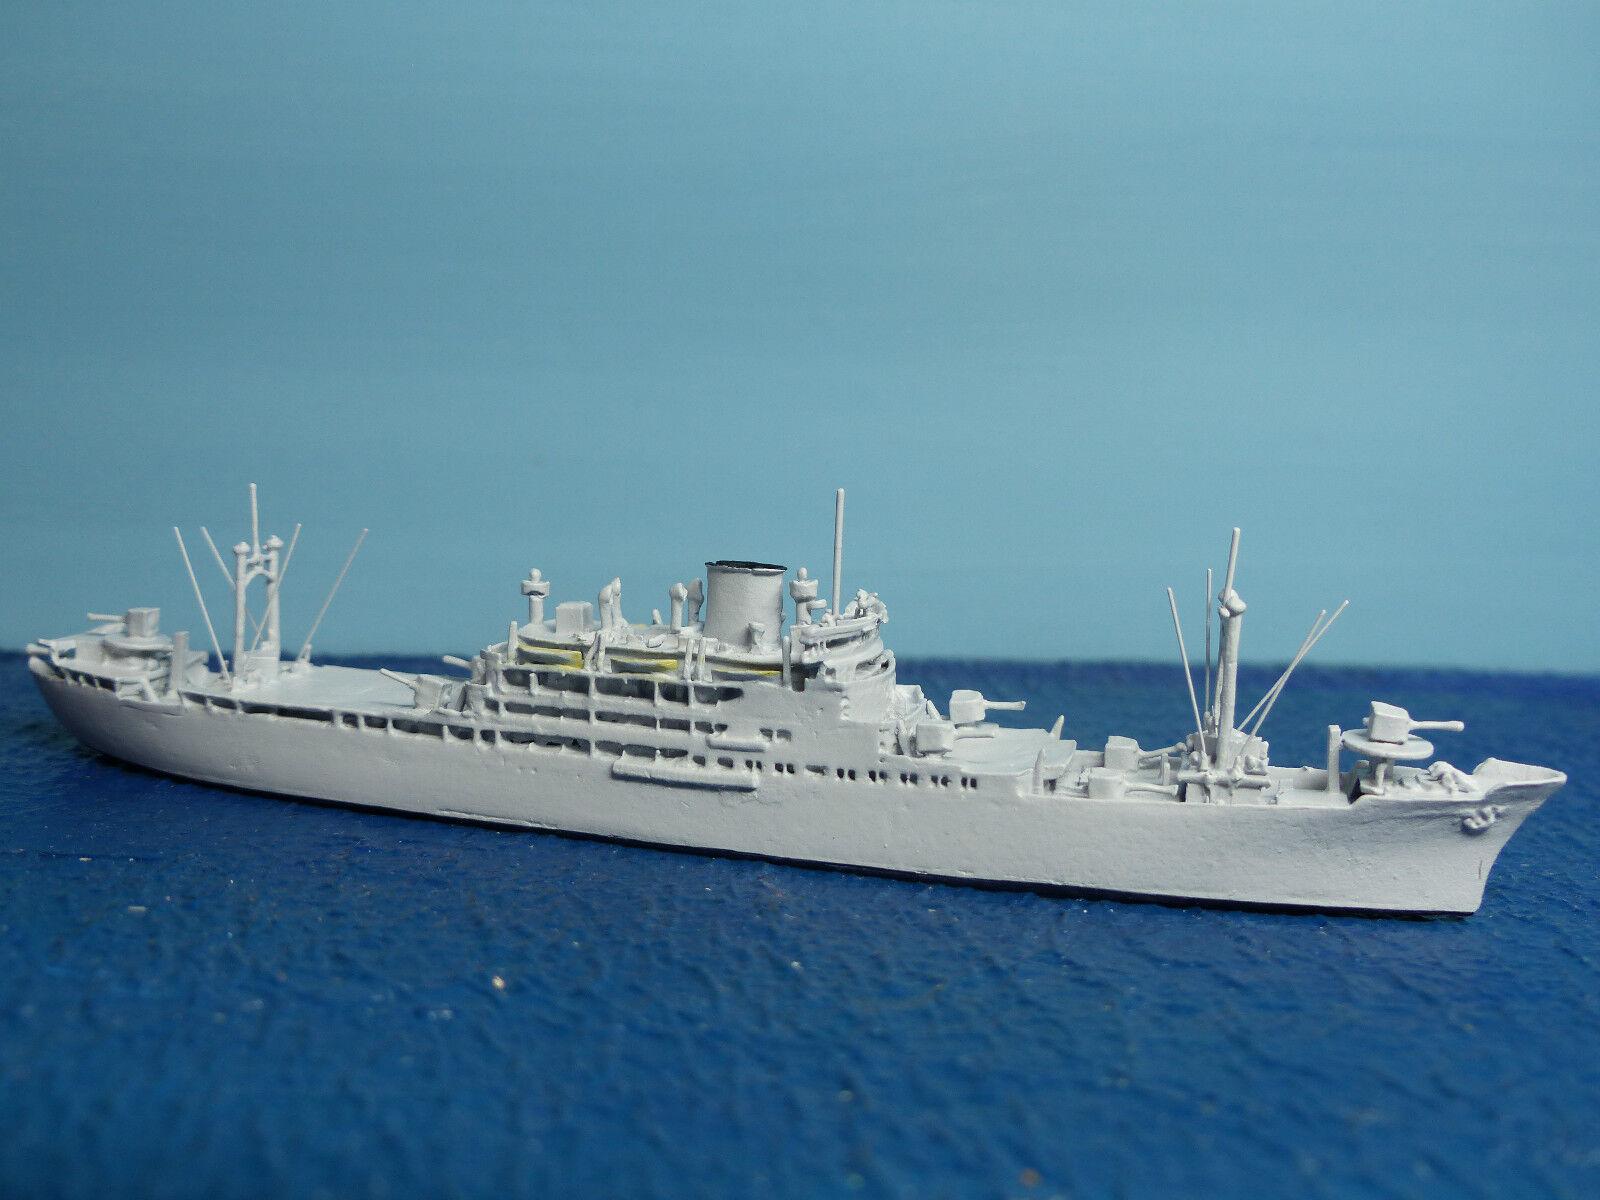 Cm barco 1 1250 J. Hilfskreuzer  Gokoku Maru  cm p 161 OVP novedad